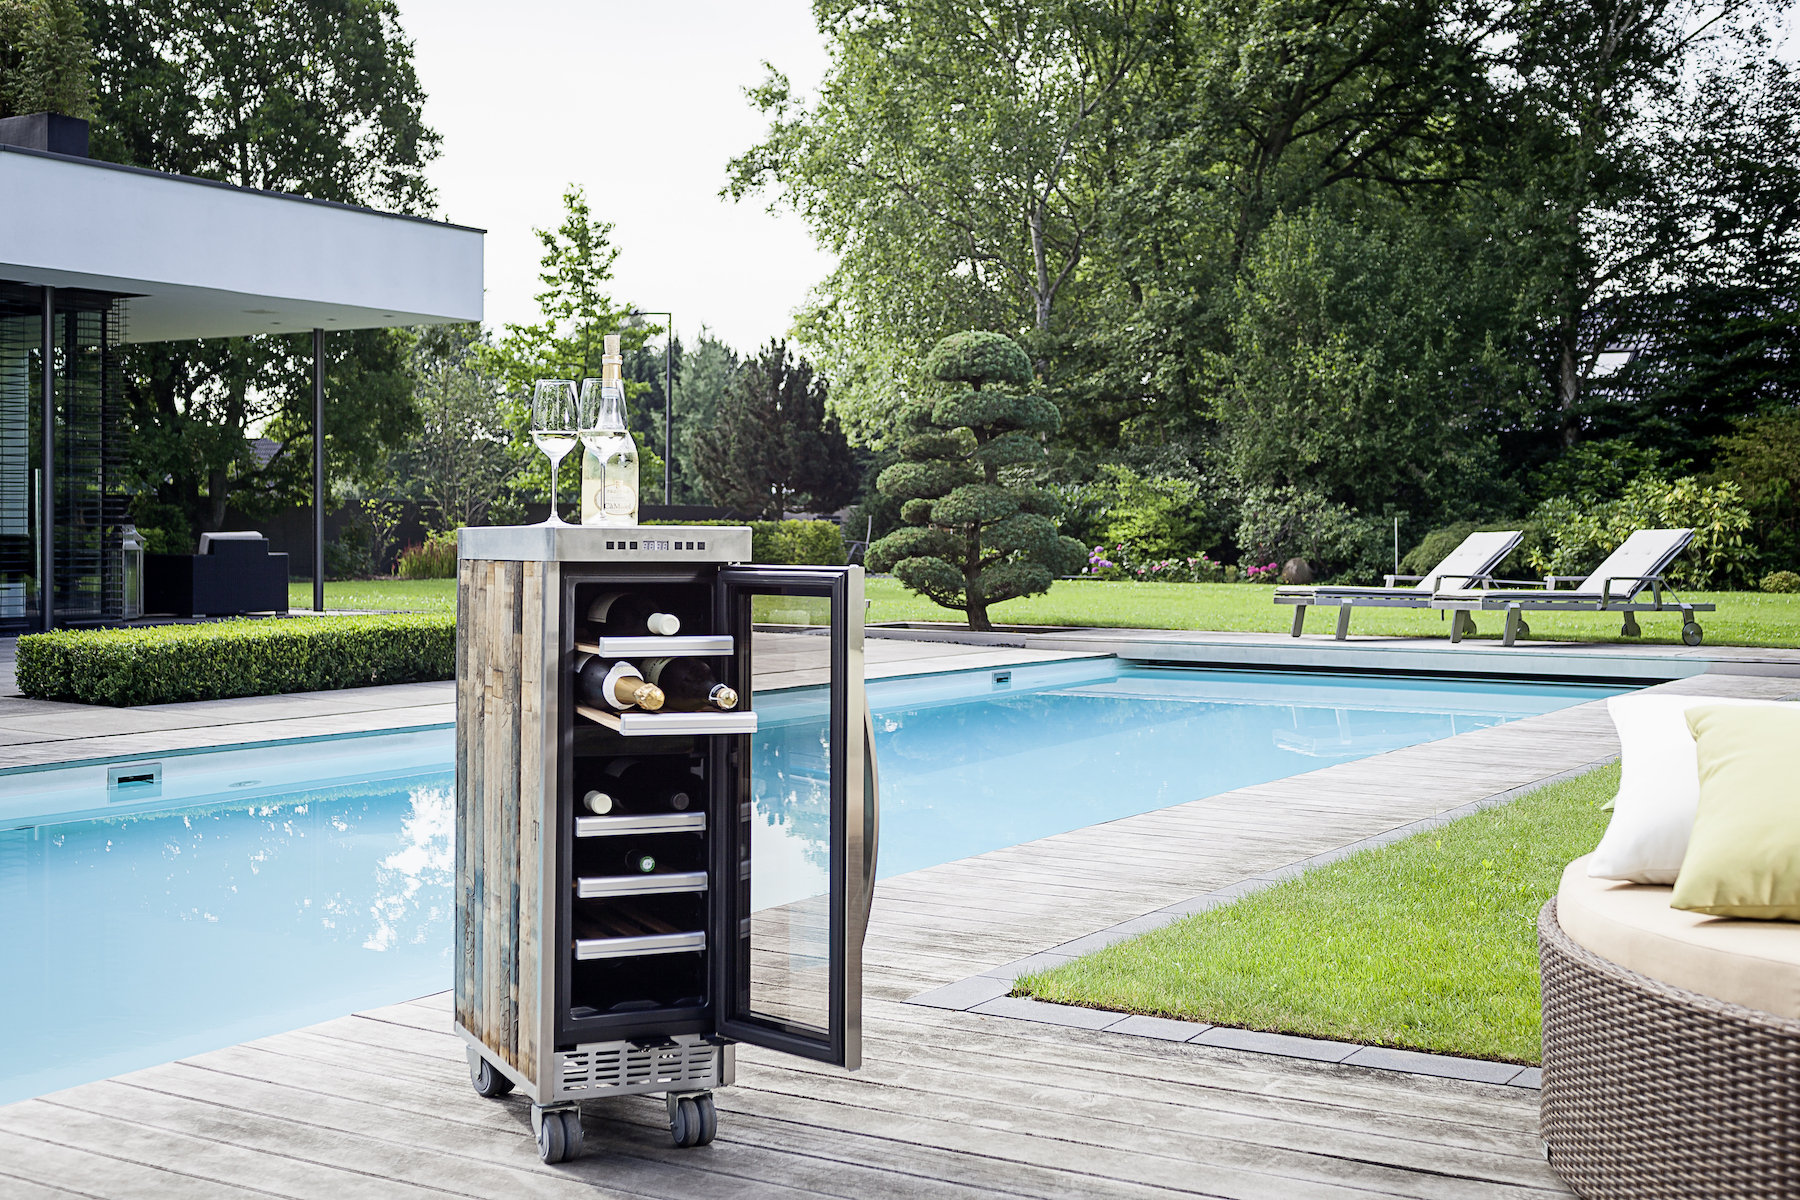 skypak-trolley-pool_bar-wine_bar-whisky_bar-cooler-la_barrique_edition